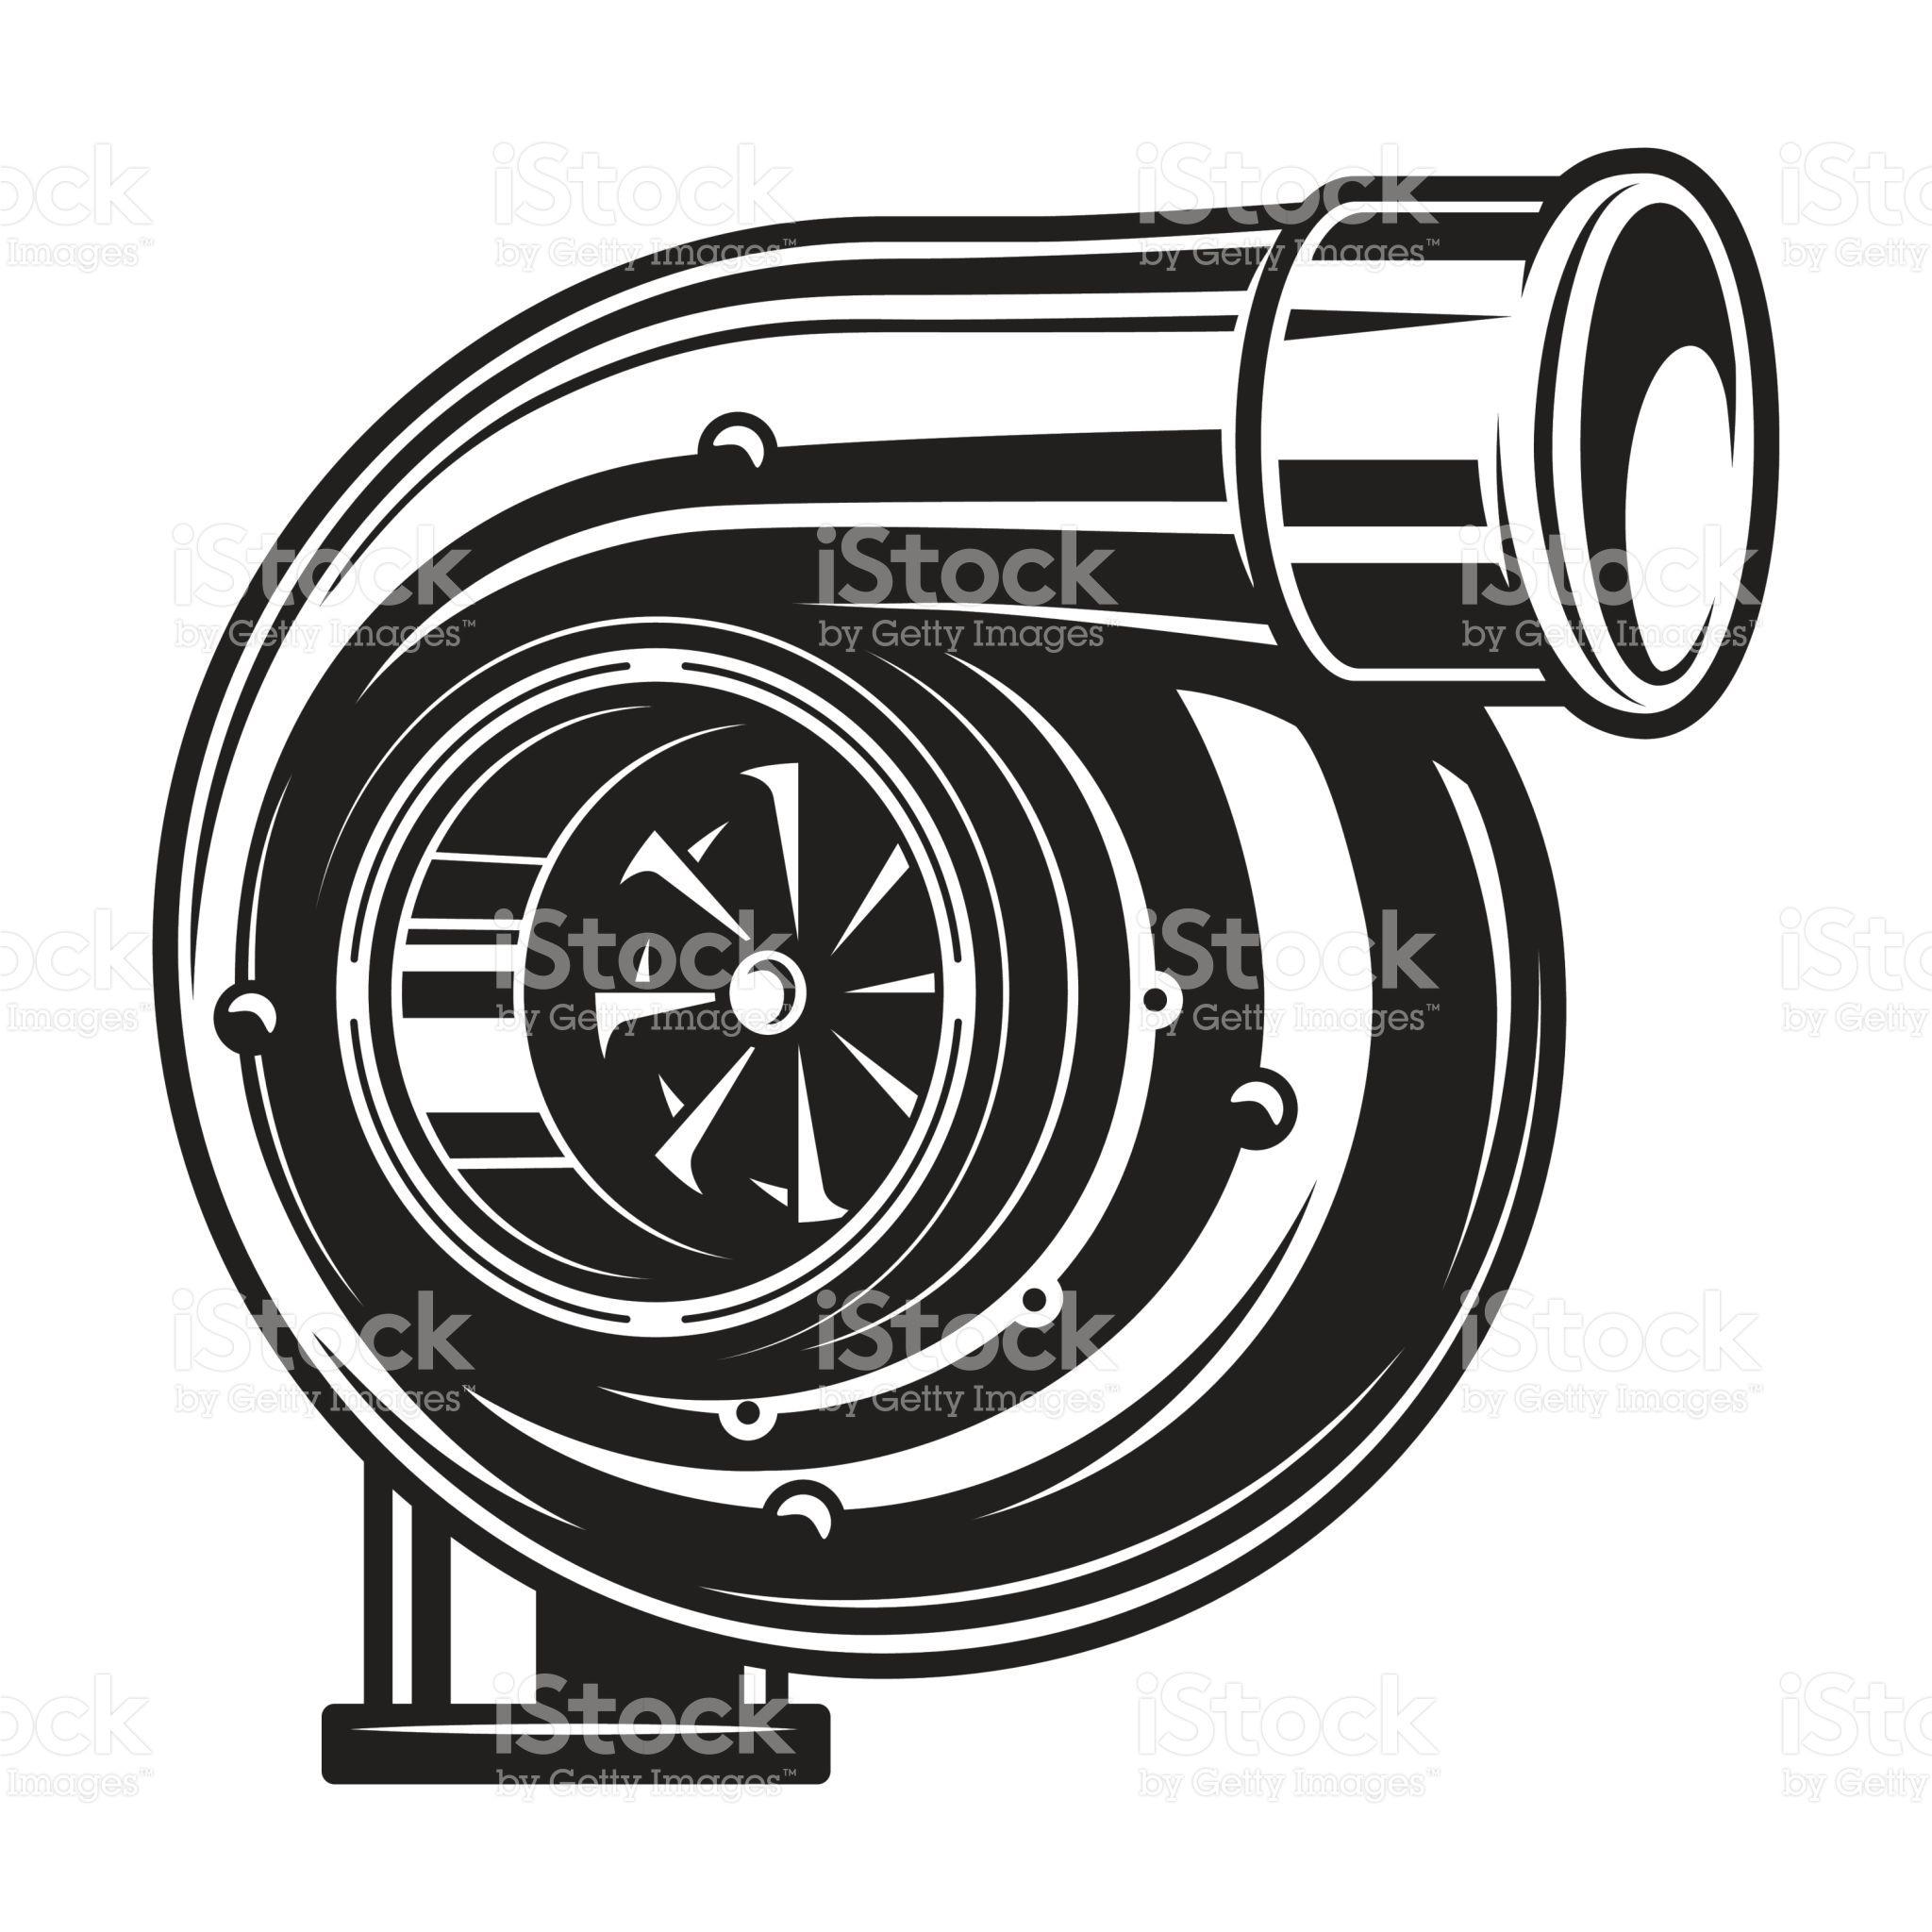 Isolated monochrome illustration of car turbocharger on